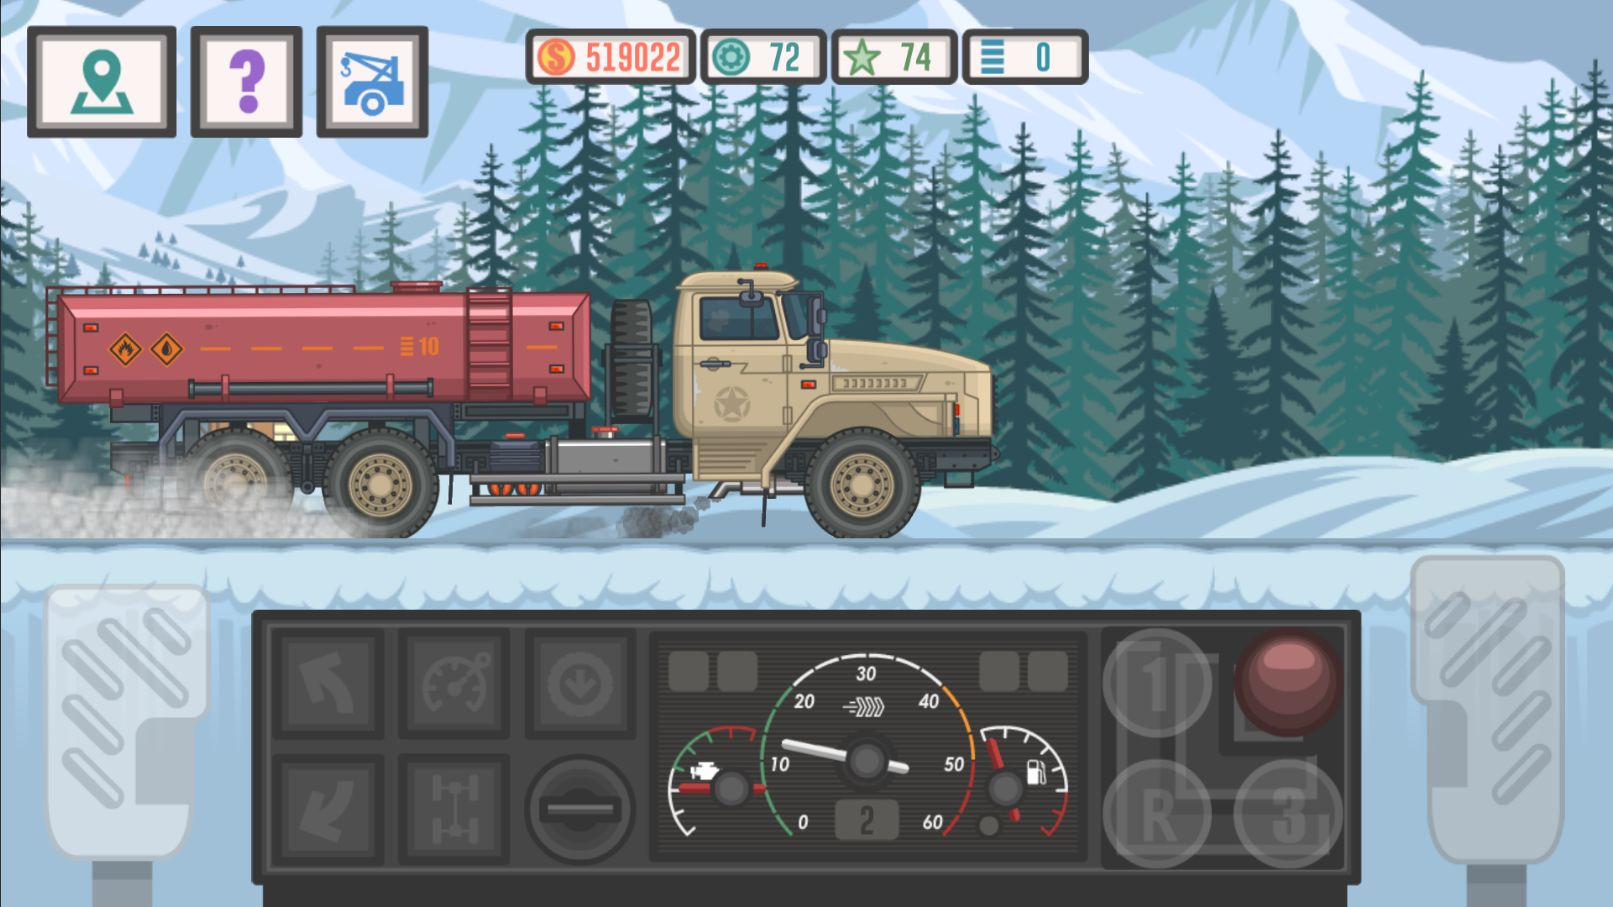 Best Trucker 2 capture d'écran 1